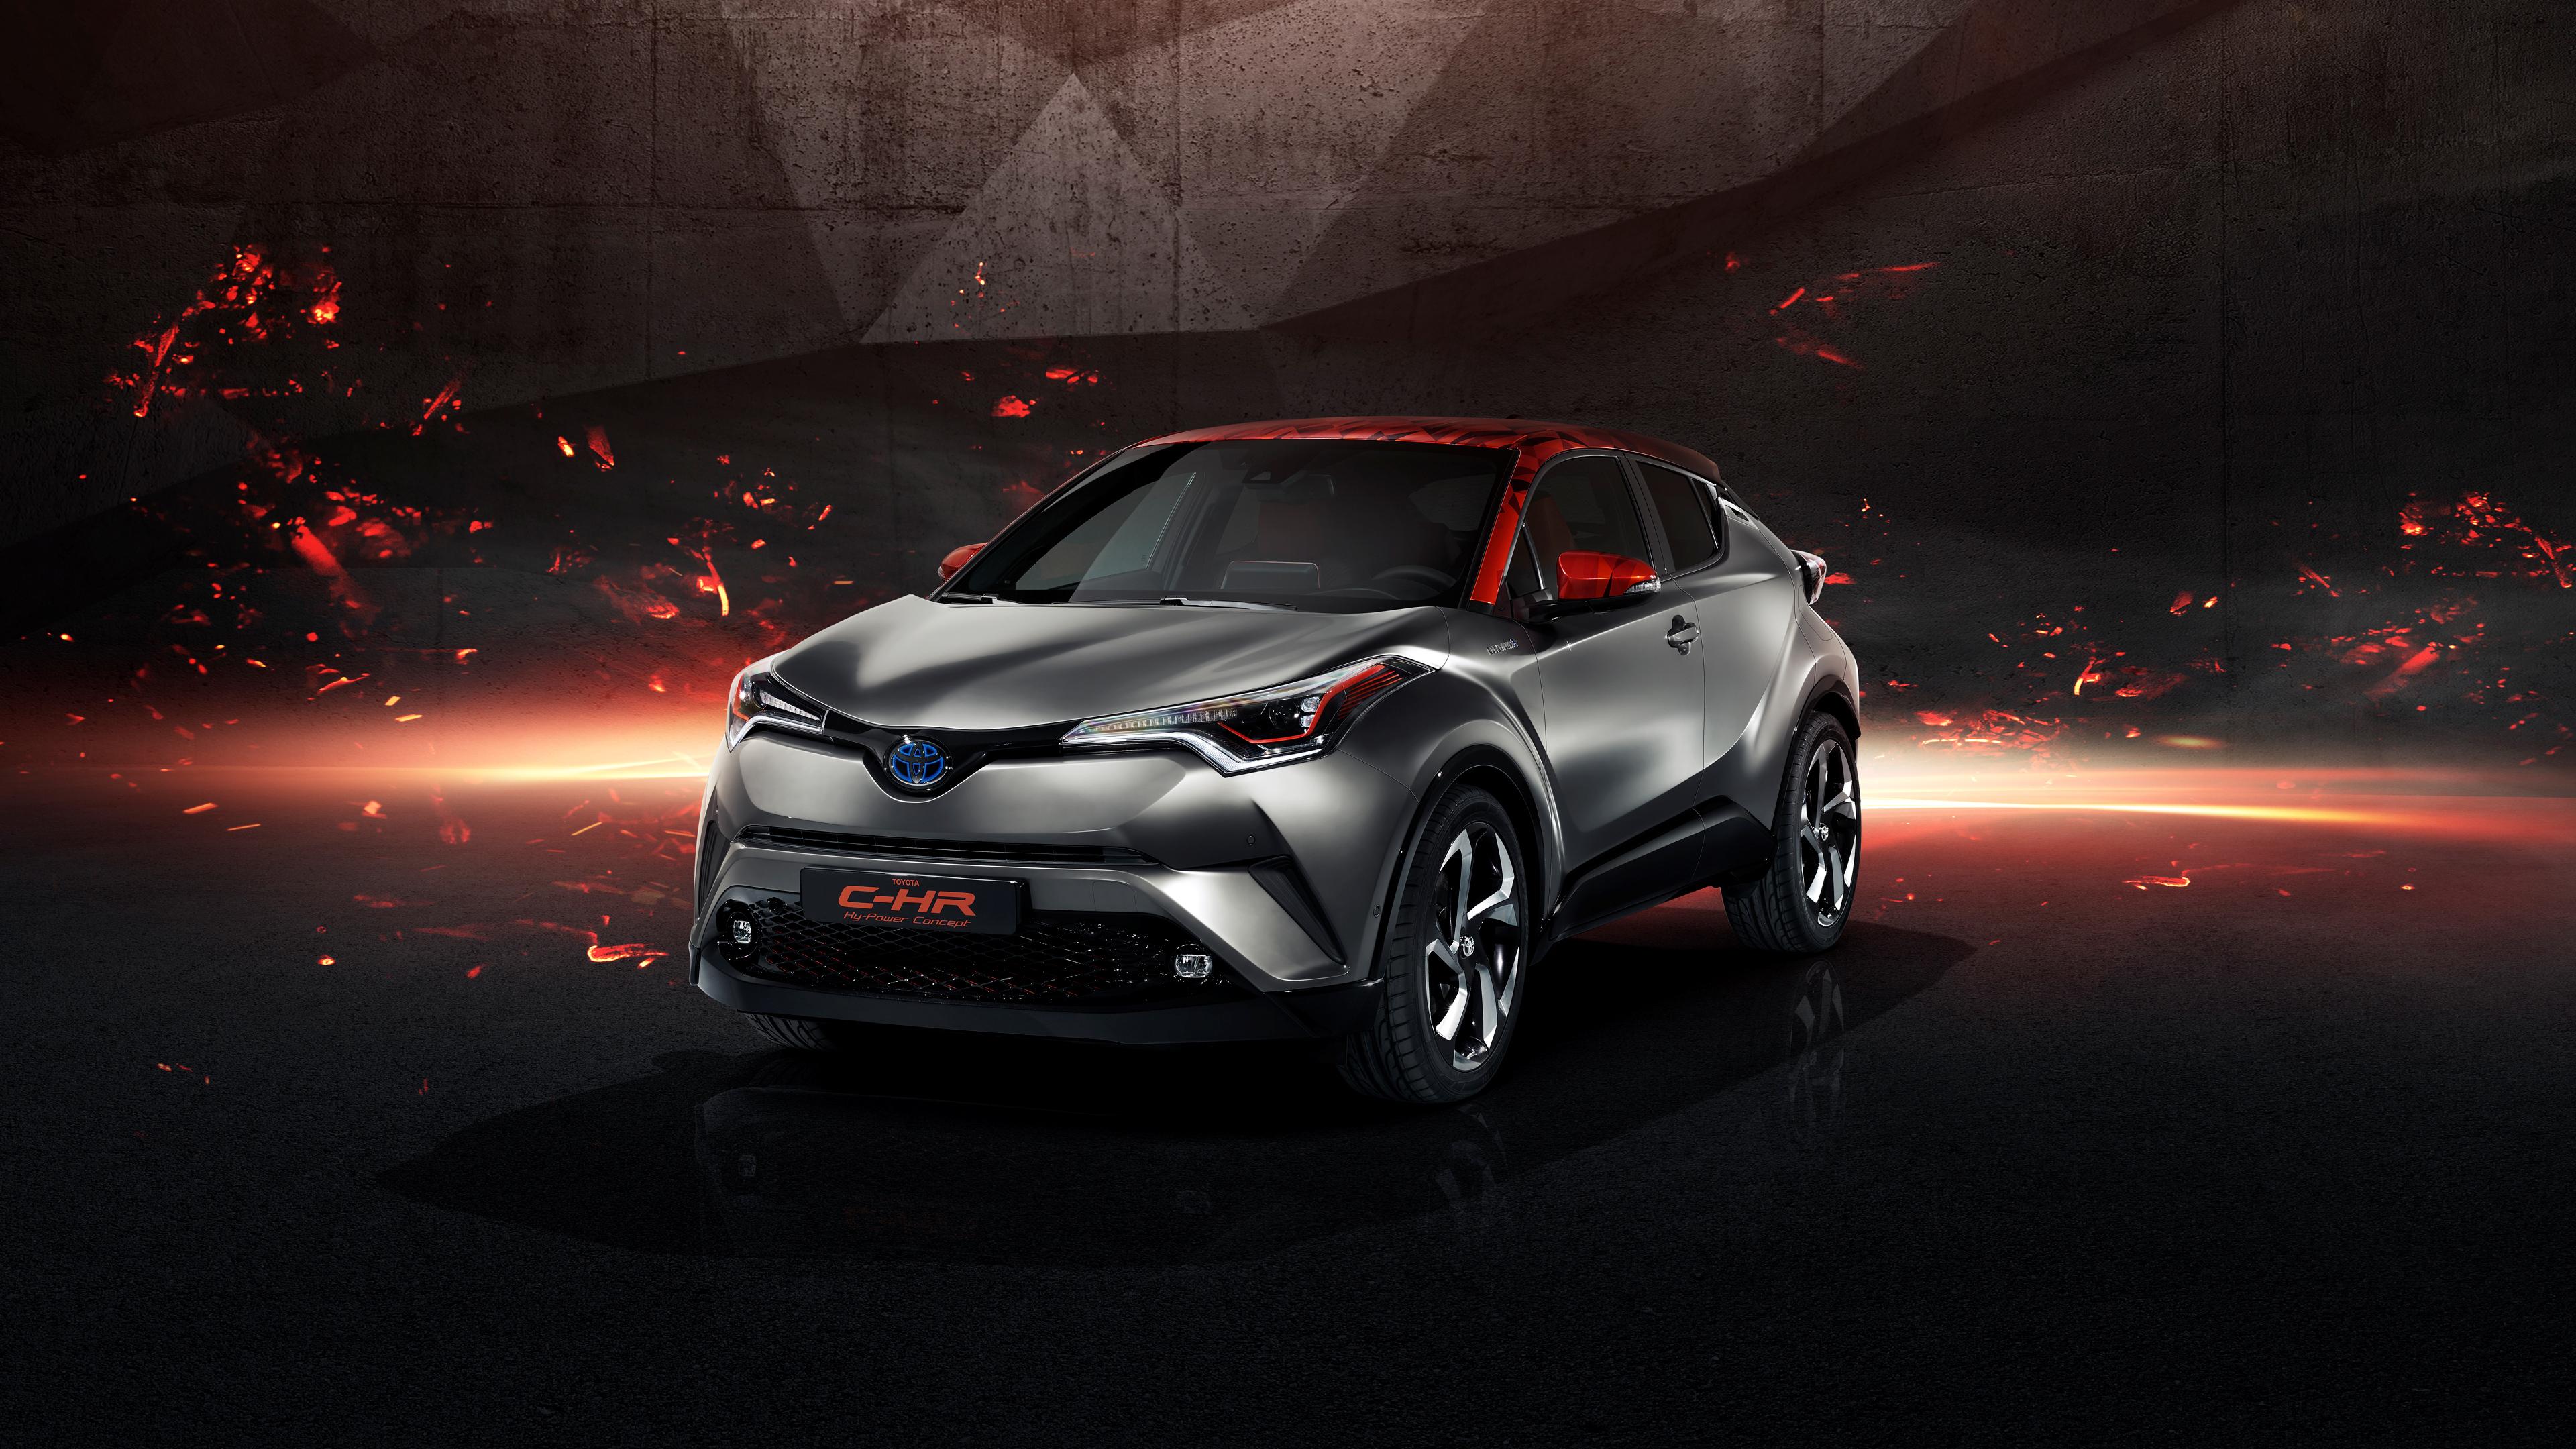 Toyota Chr Wallpaper 4k , HD Wallpaper & Backgrounds